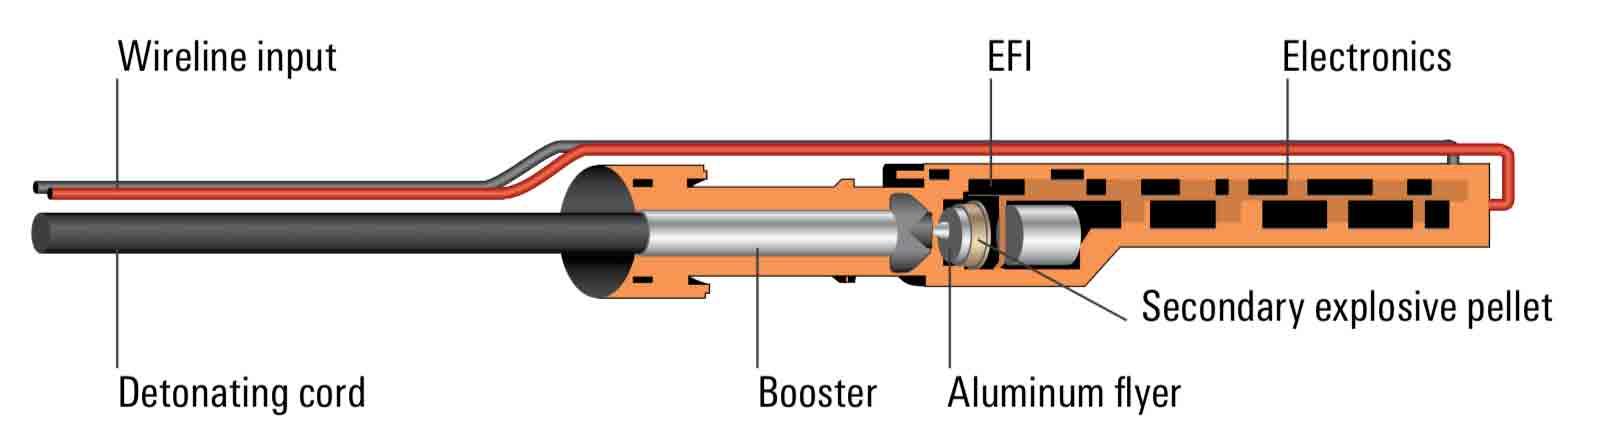 Secure2 RF-Safe Electronic Detonator